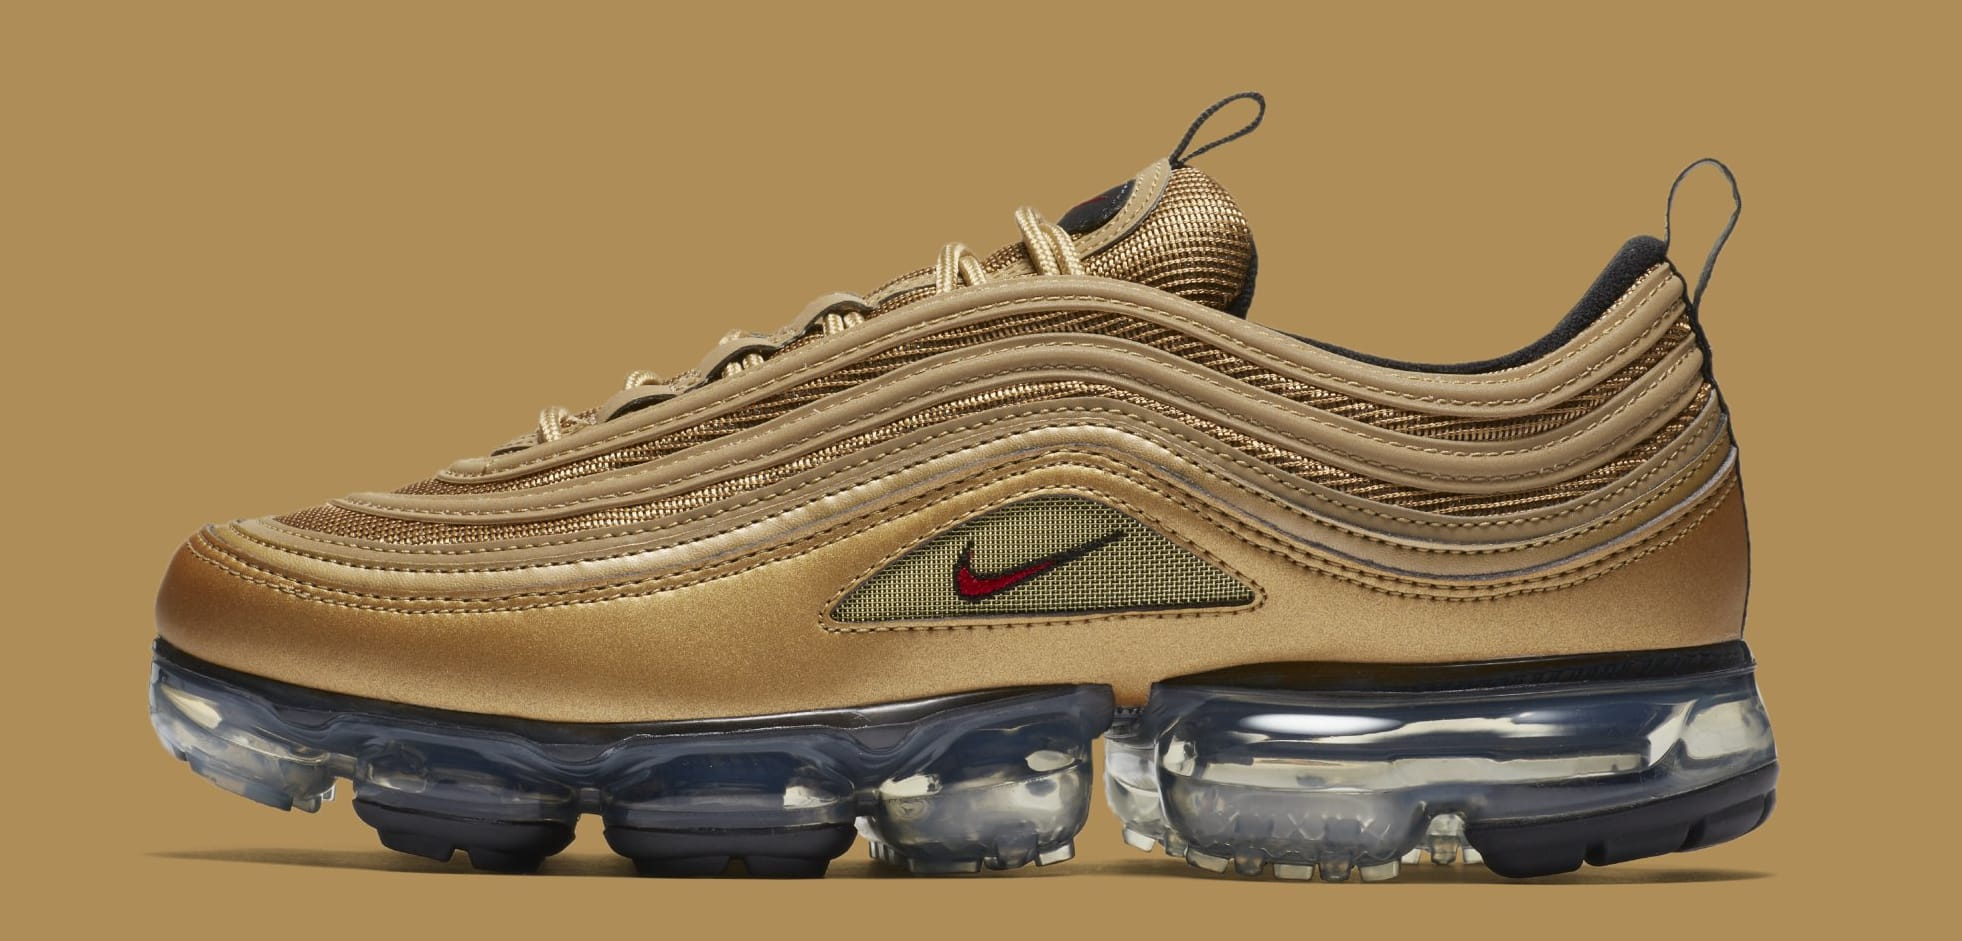 official photos 1c0c9 d5505 Nike Air VaporMax 97 'Metallic Gold' AJ7291-700 Release ...